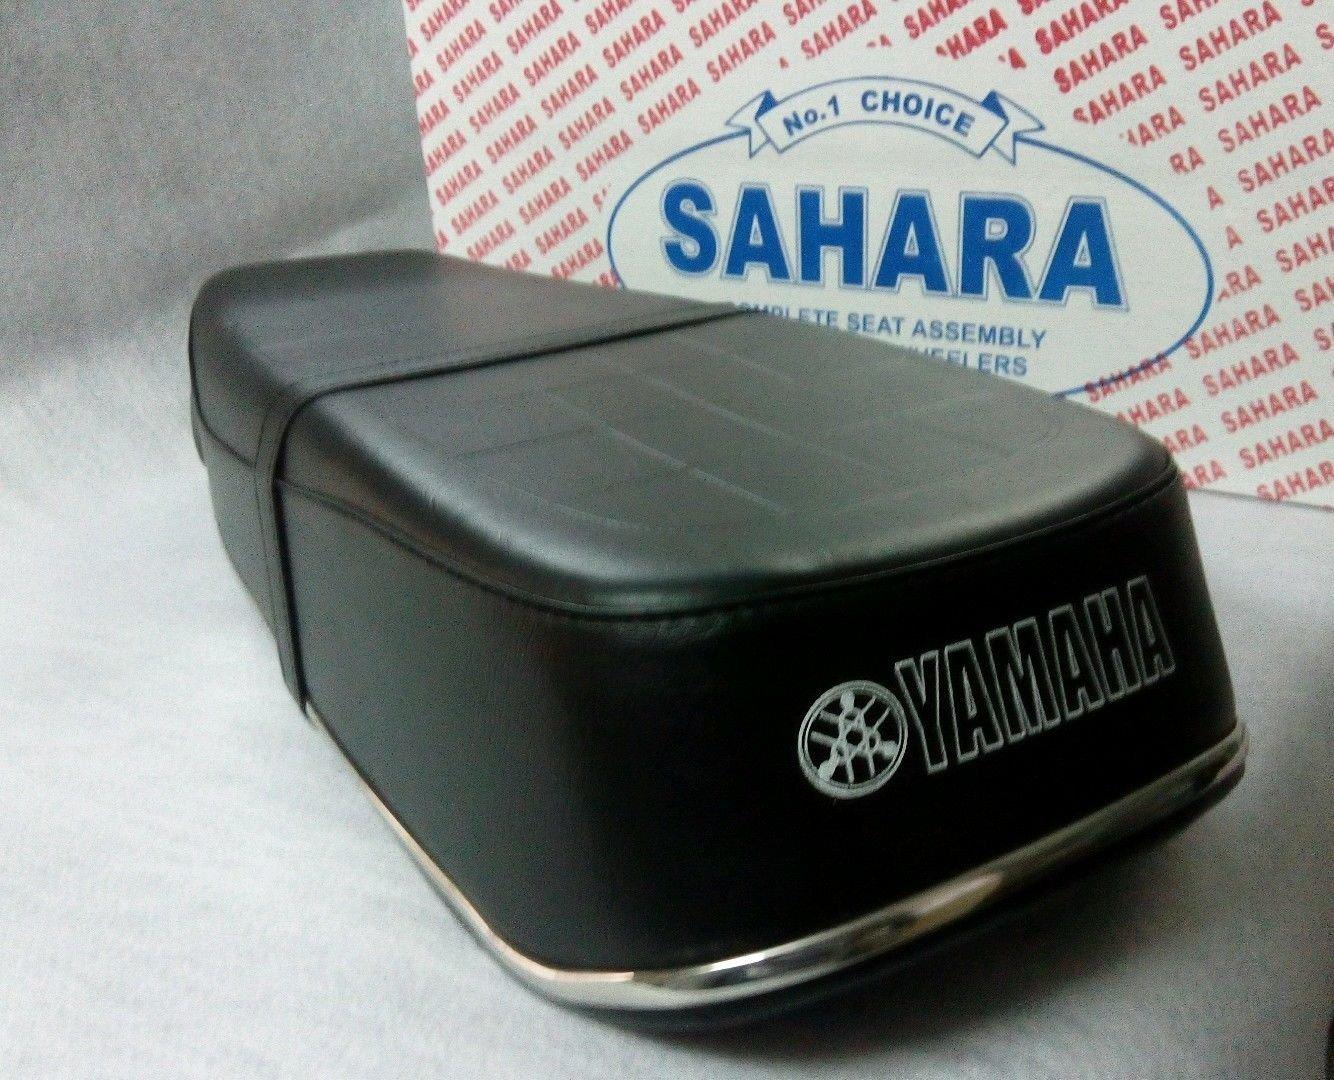 Sahara YAMAHA RX-100/Complete seat/Seat assembly